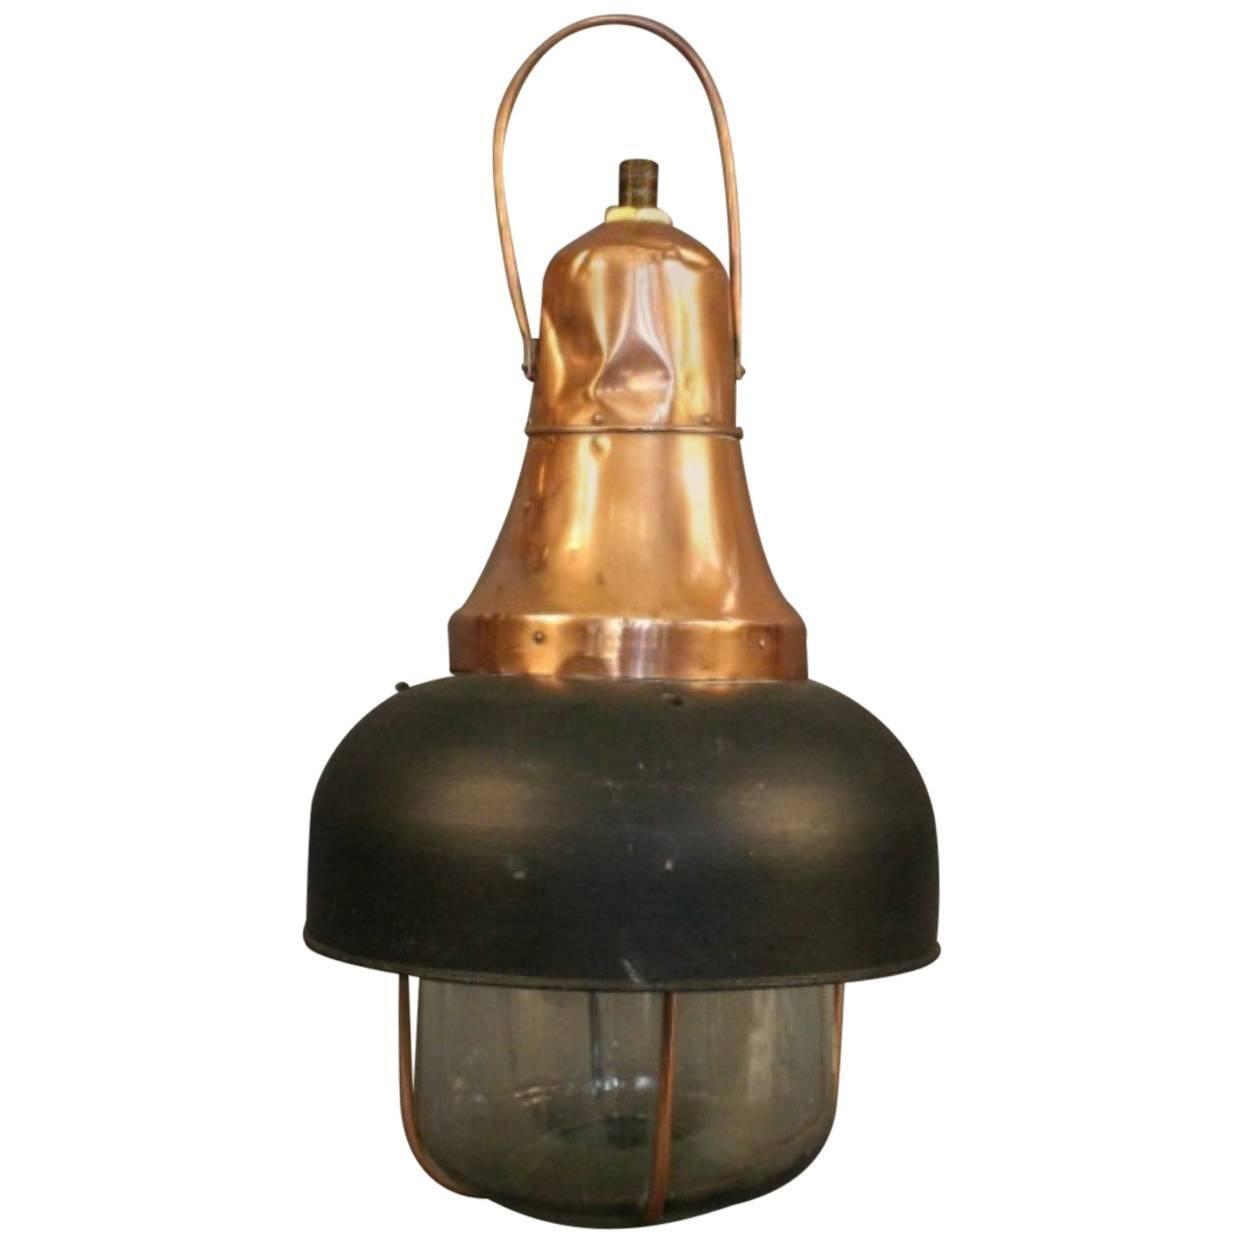 Copper Ship's Cargo Light